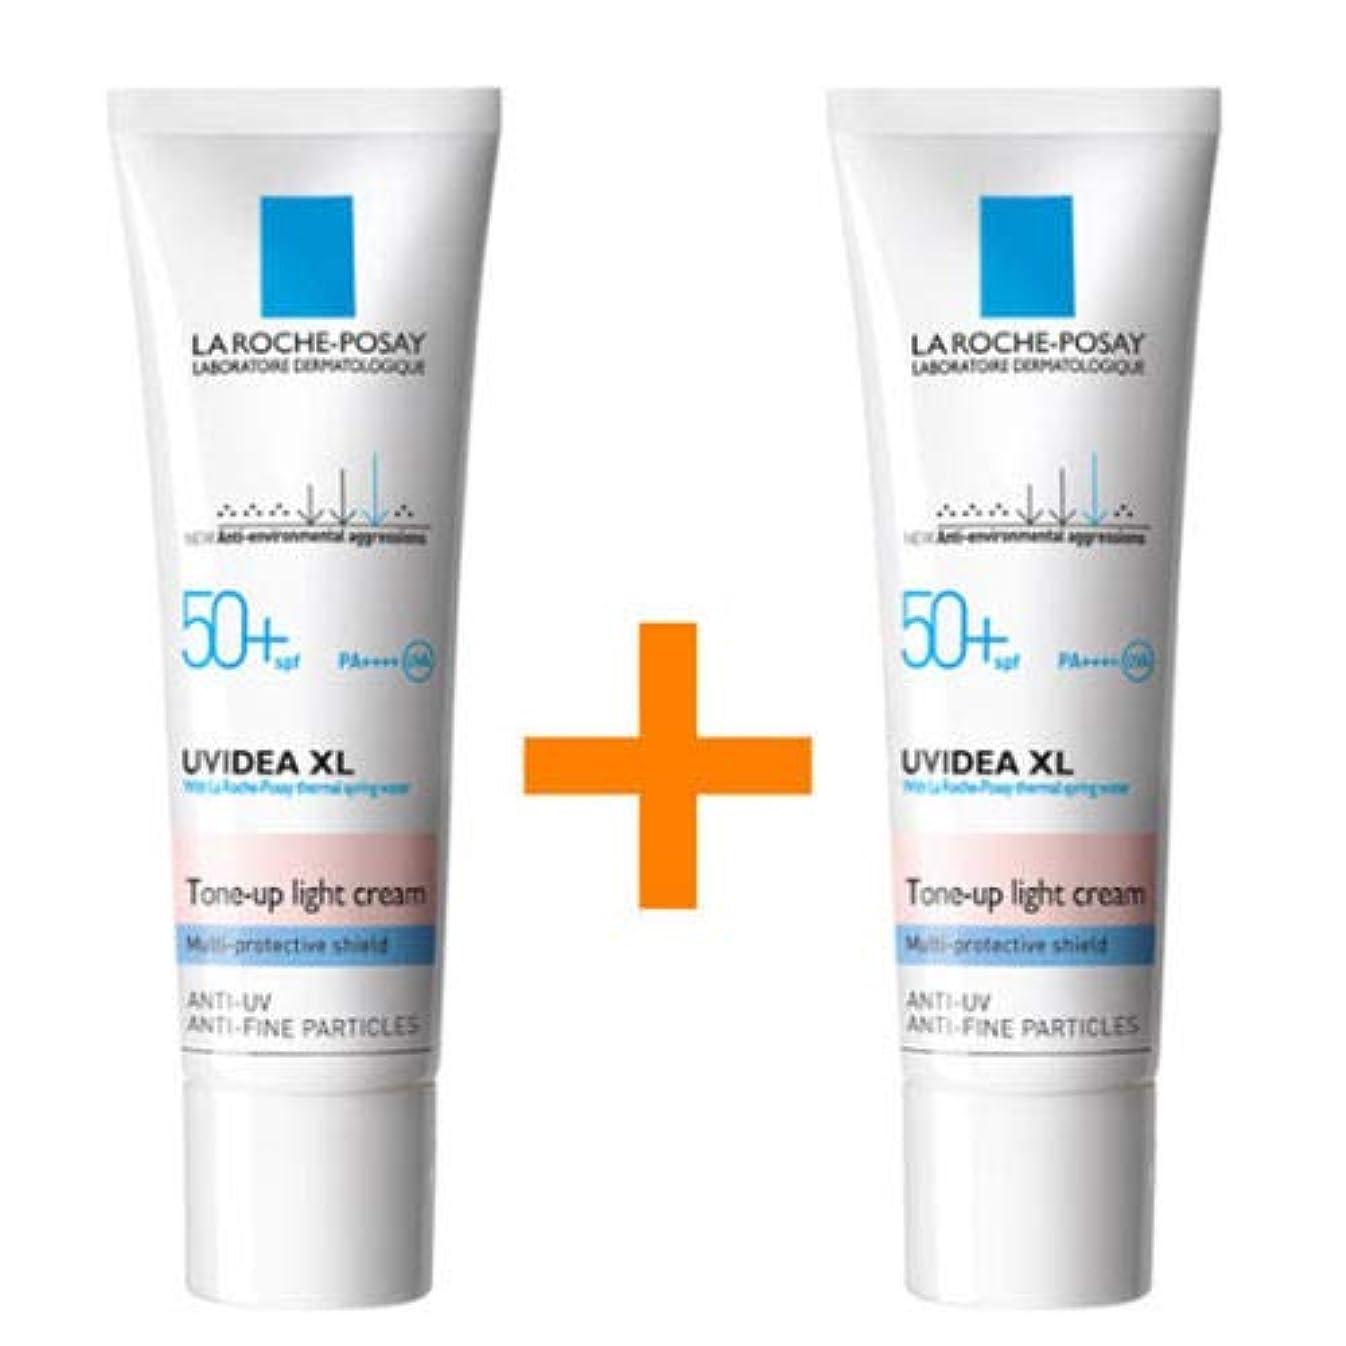 [1+1] La Roche-Posay ラロッシュポゼ UVイデア XL プロテクショントーンアップ Uvidea XL Tone-up Light Cream (30ml)